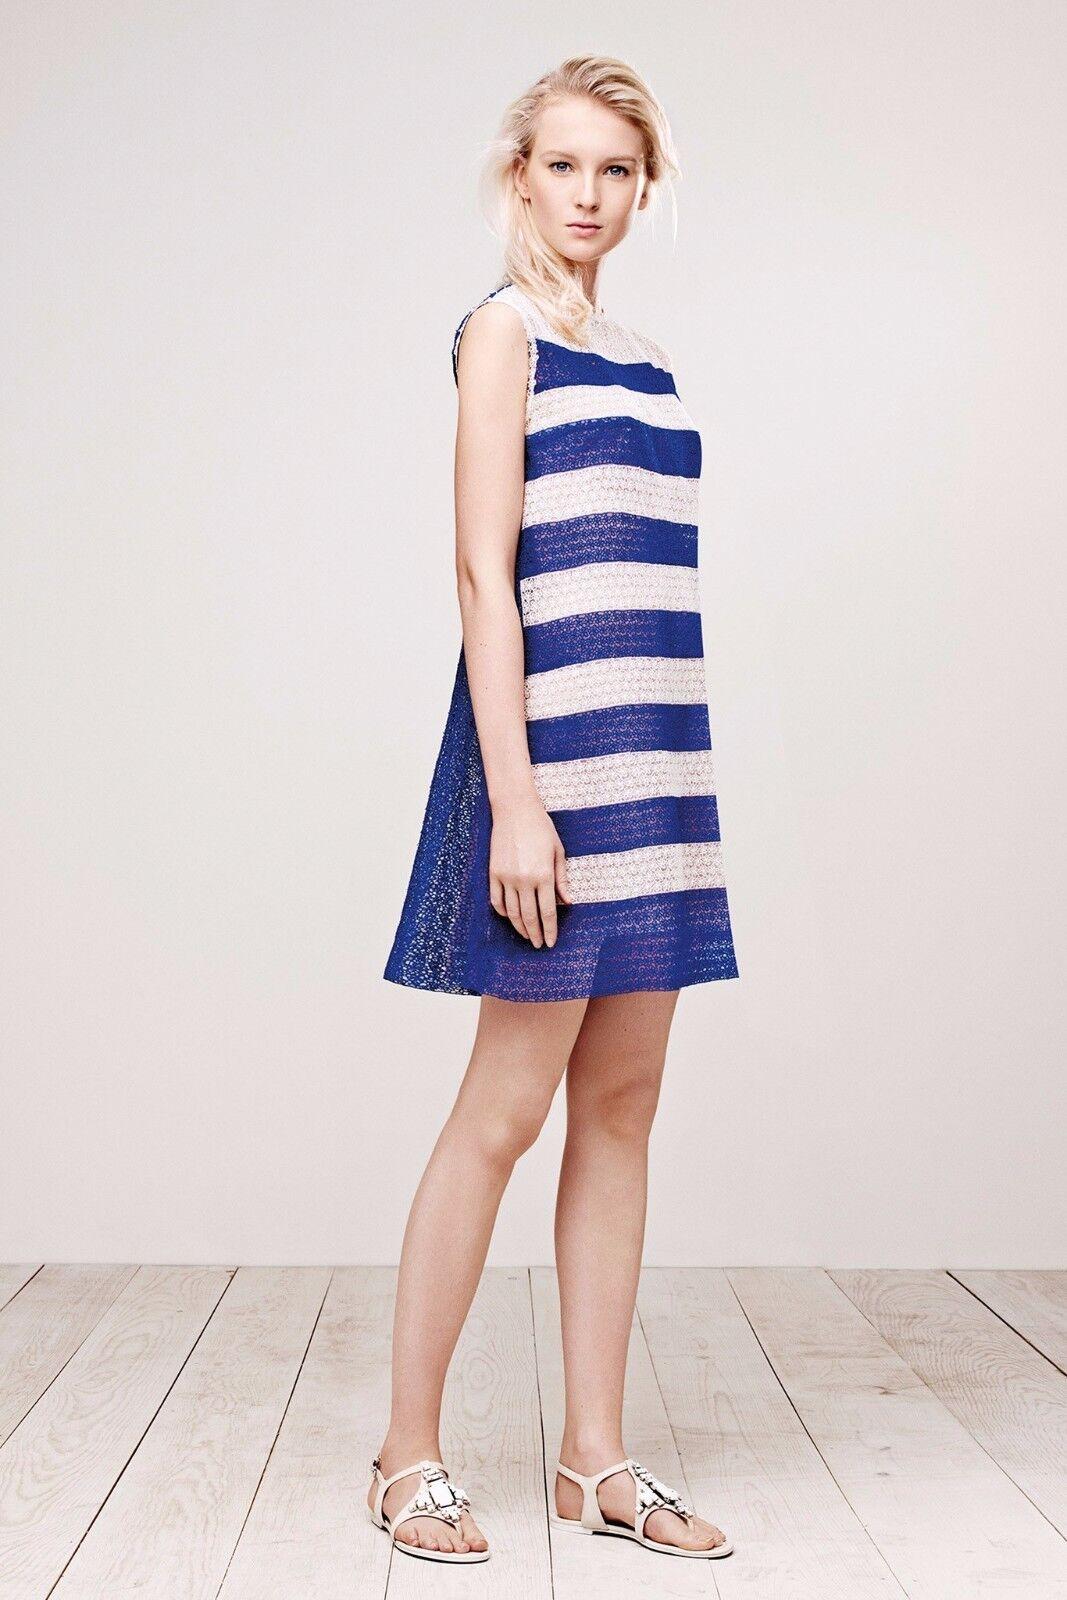 NWT TADASHI SHOJI Blau Weiß Striped Micro Floral LACE Tunic Sheath Dress 12